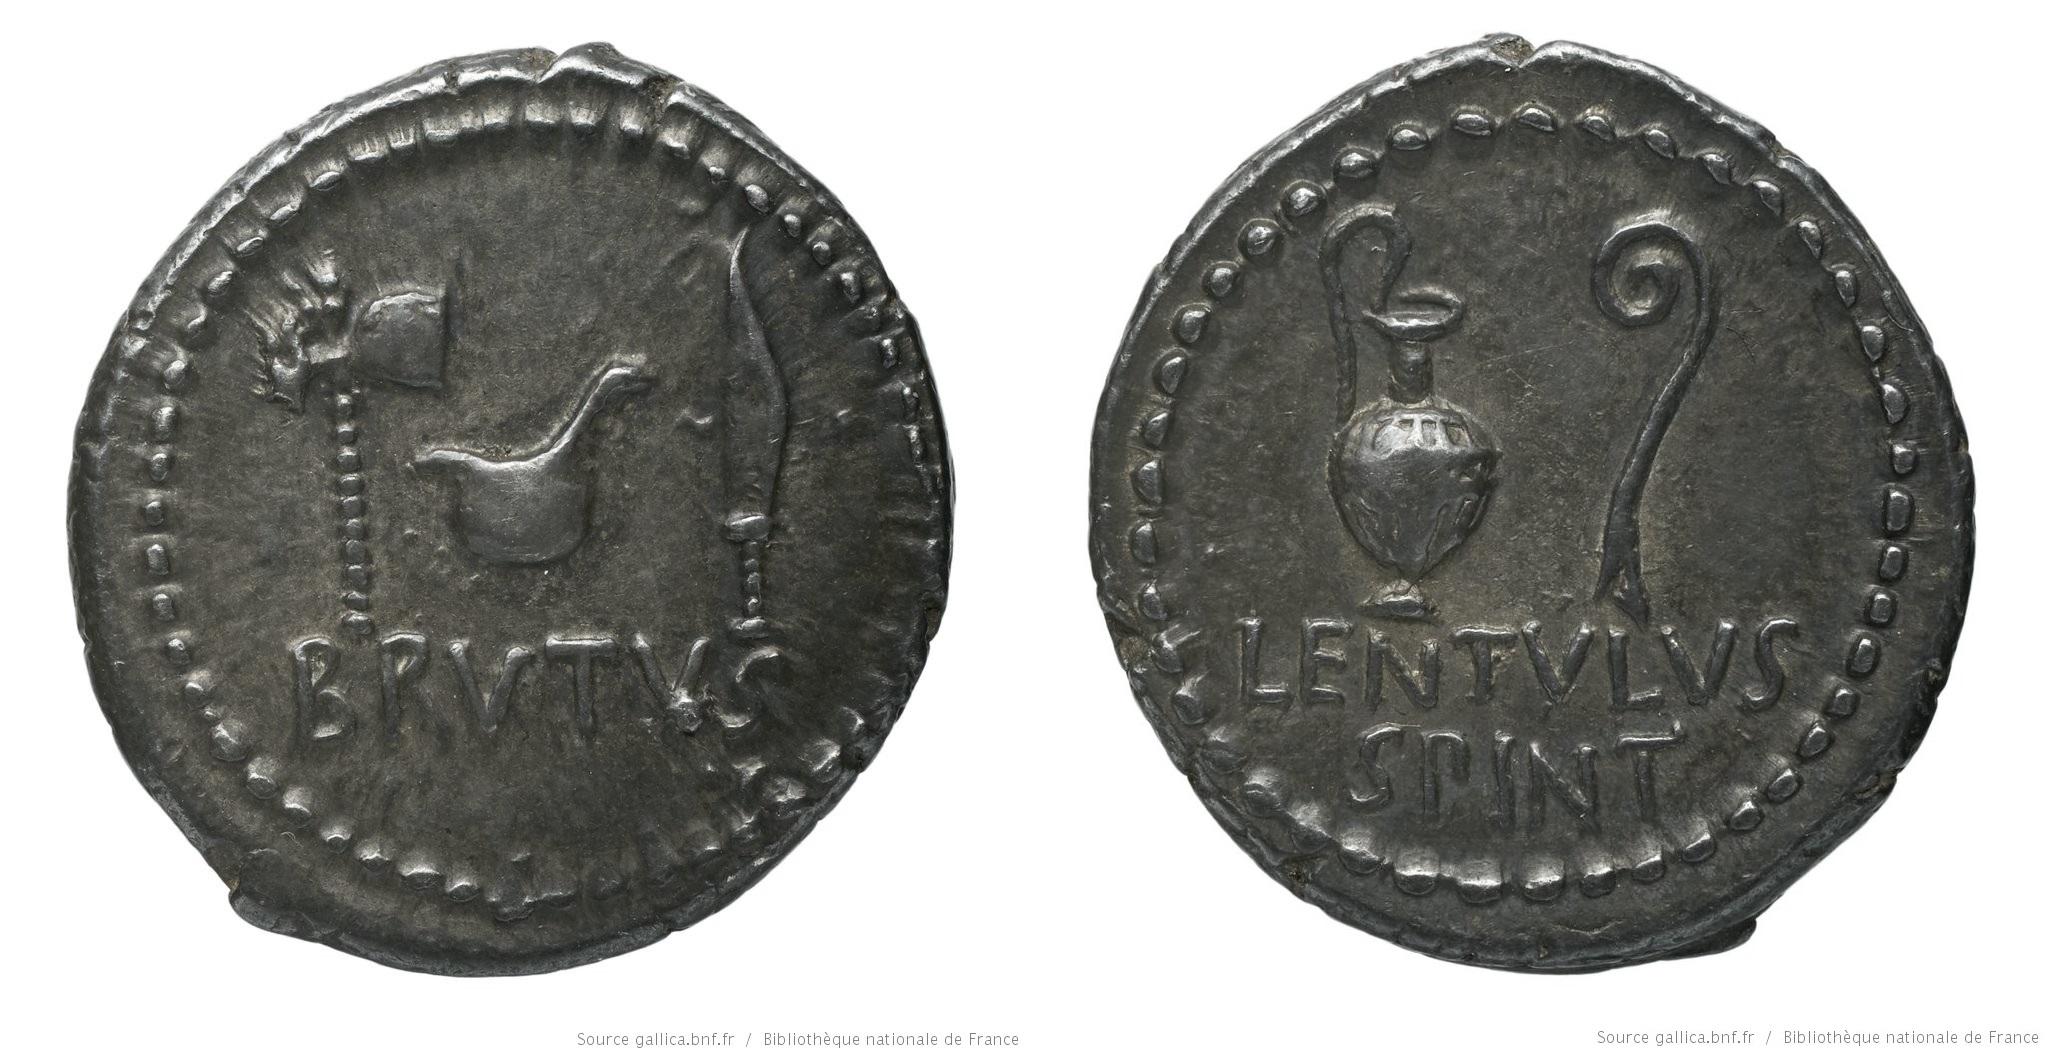 1639JU – Denier Brutus – Lentulus Spinther